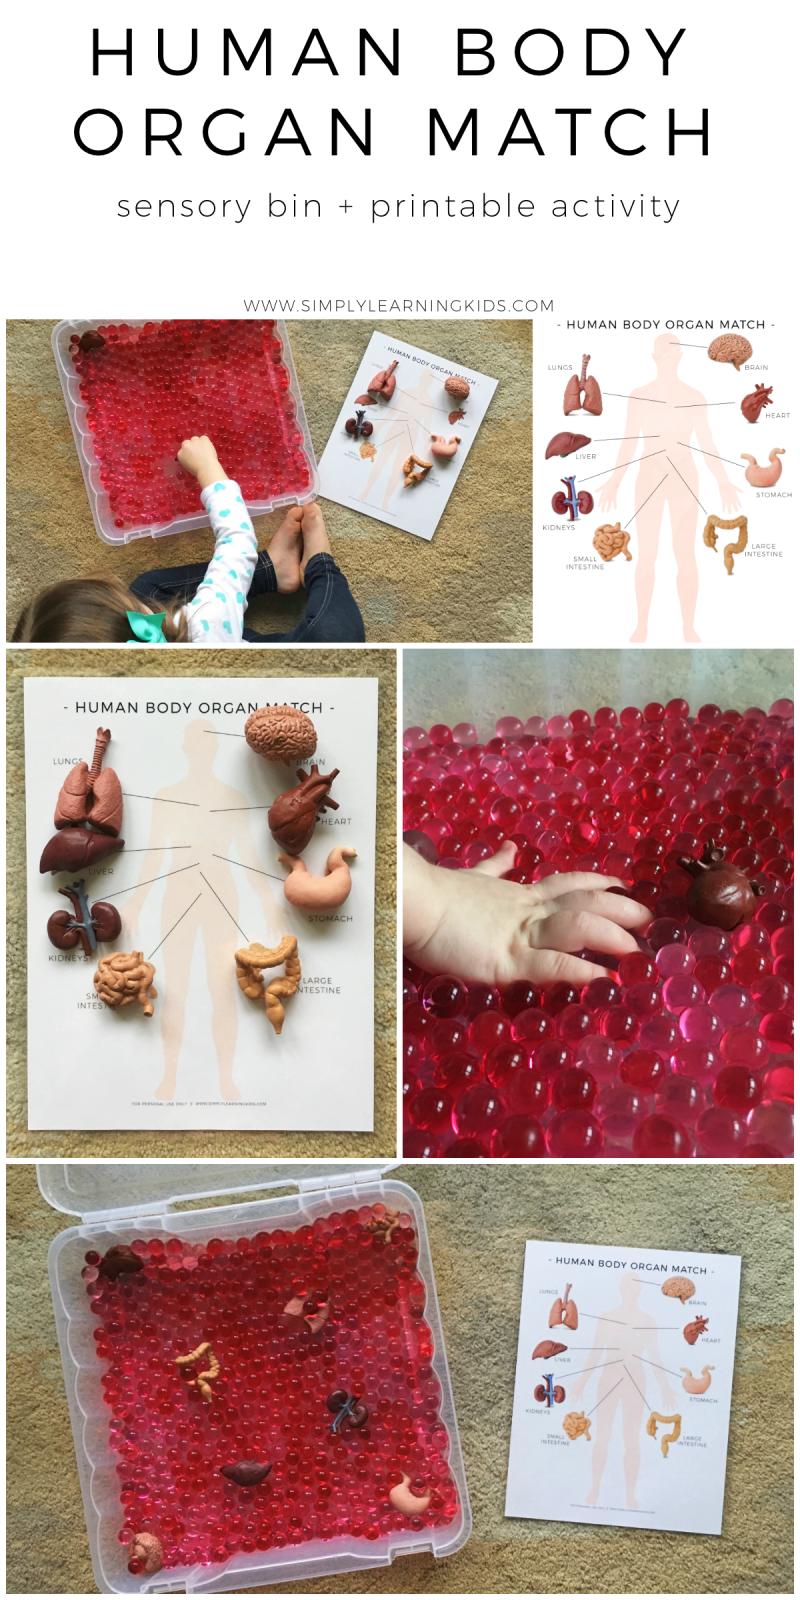 Human Body Organ Match Activity | Human body organs, Human ...